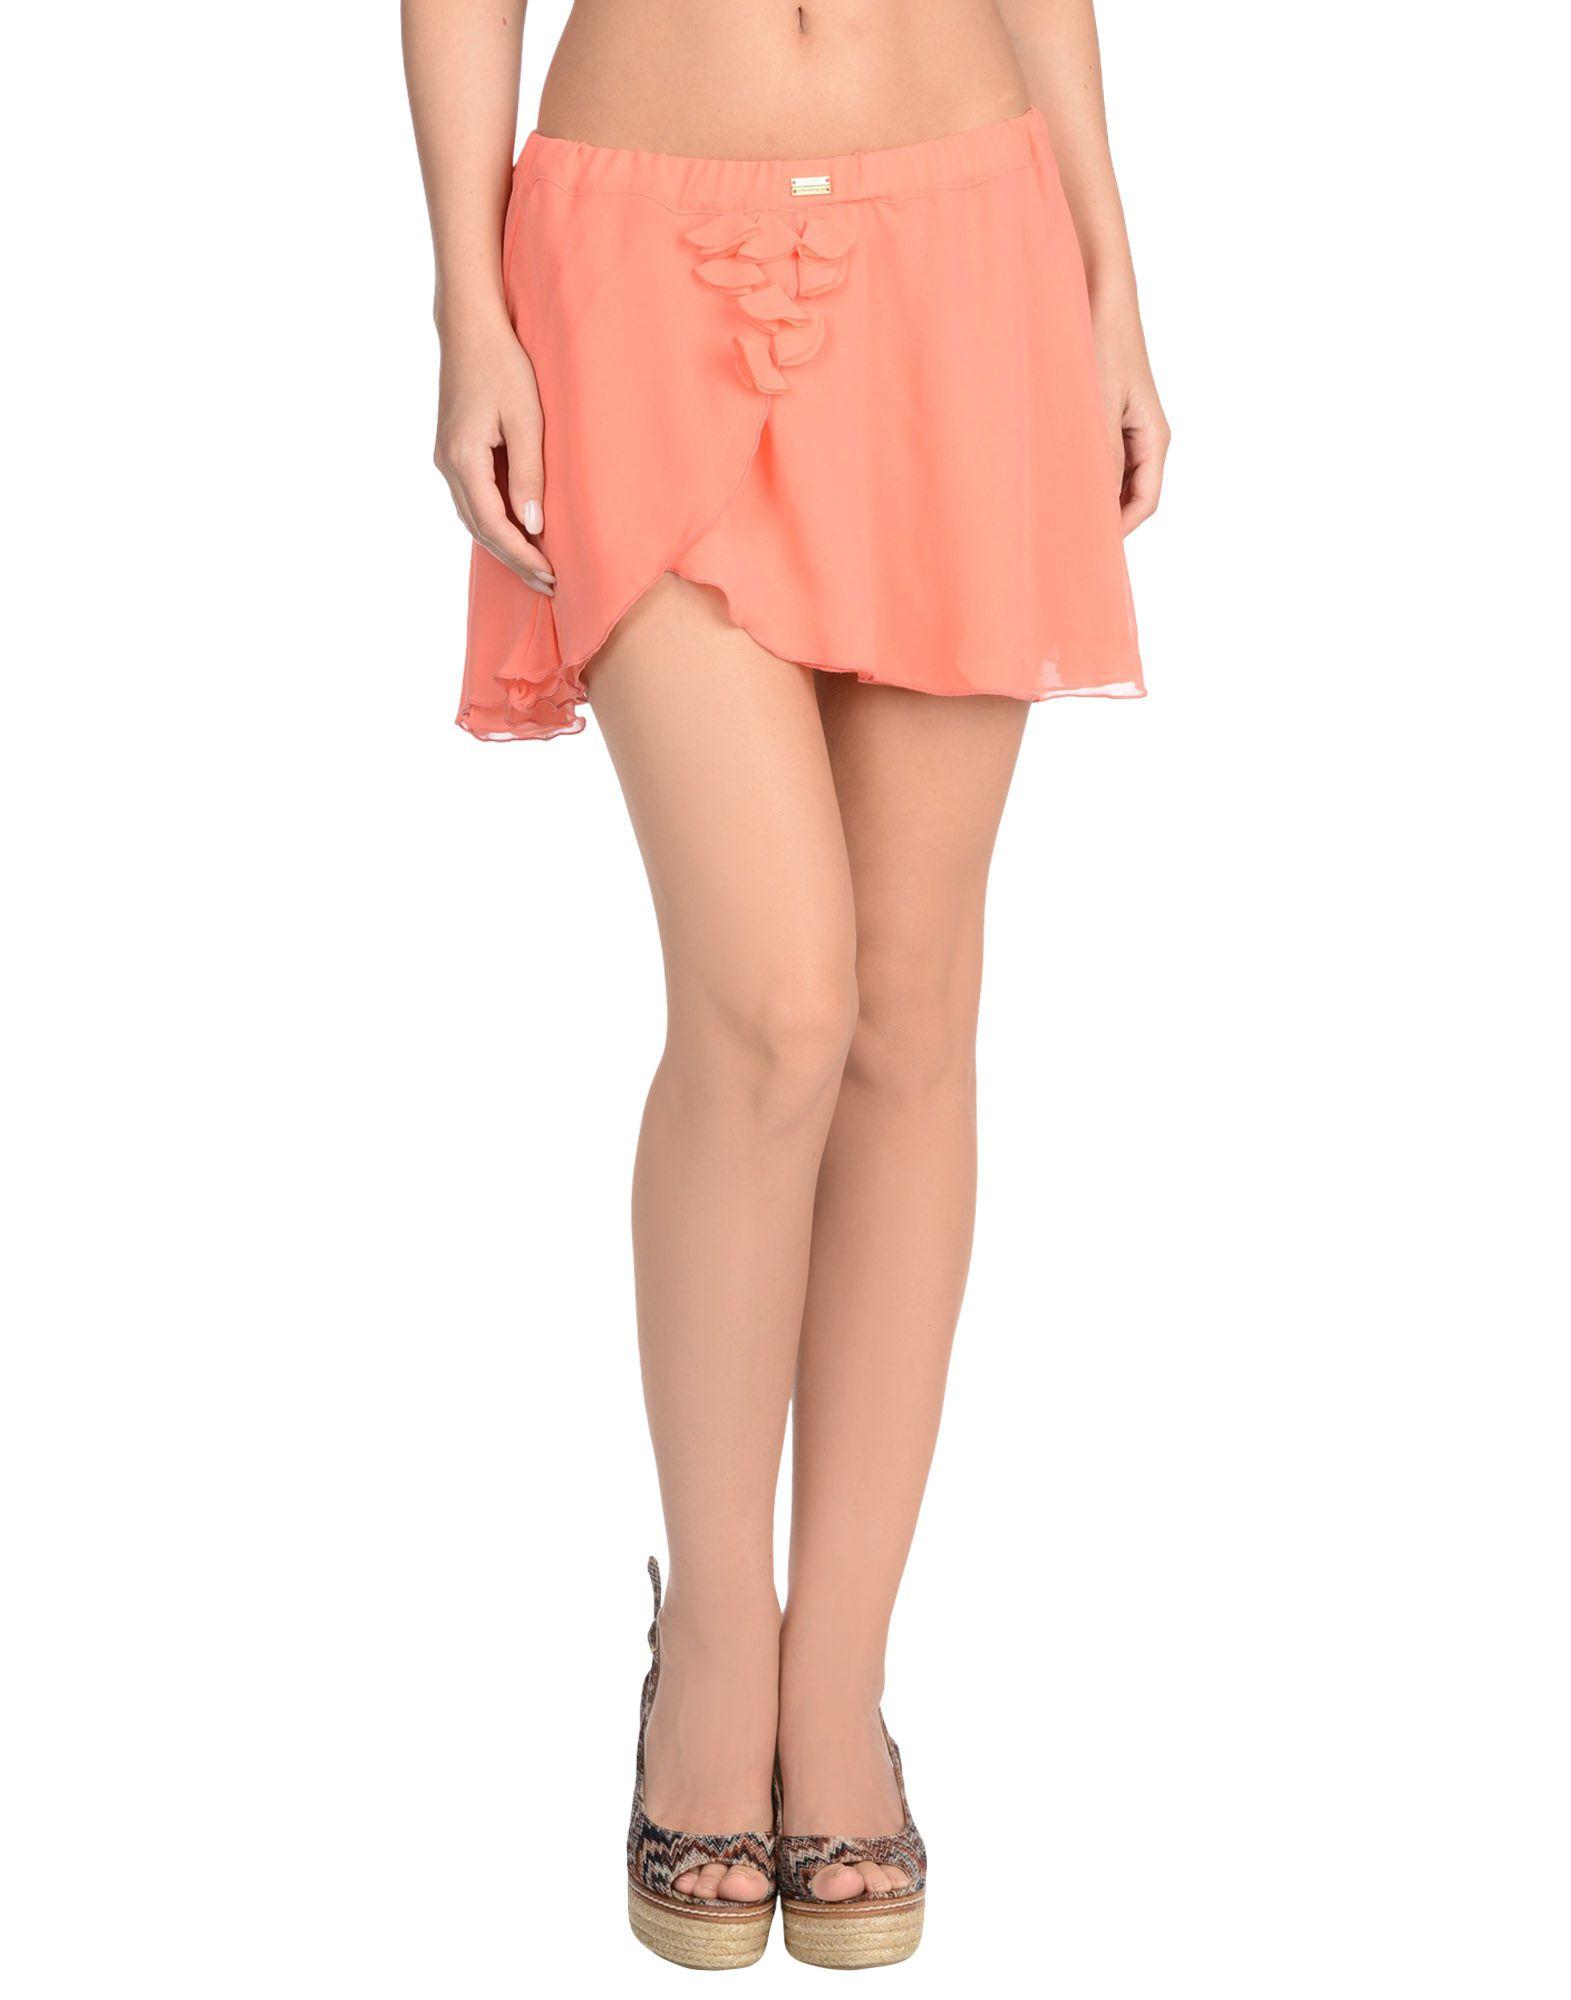 Guess Beachwear Beach Dress   Women Guess Beachwear Beach Dresses   47172289HX